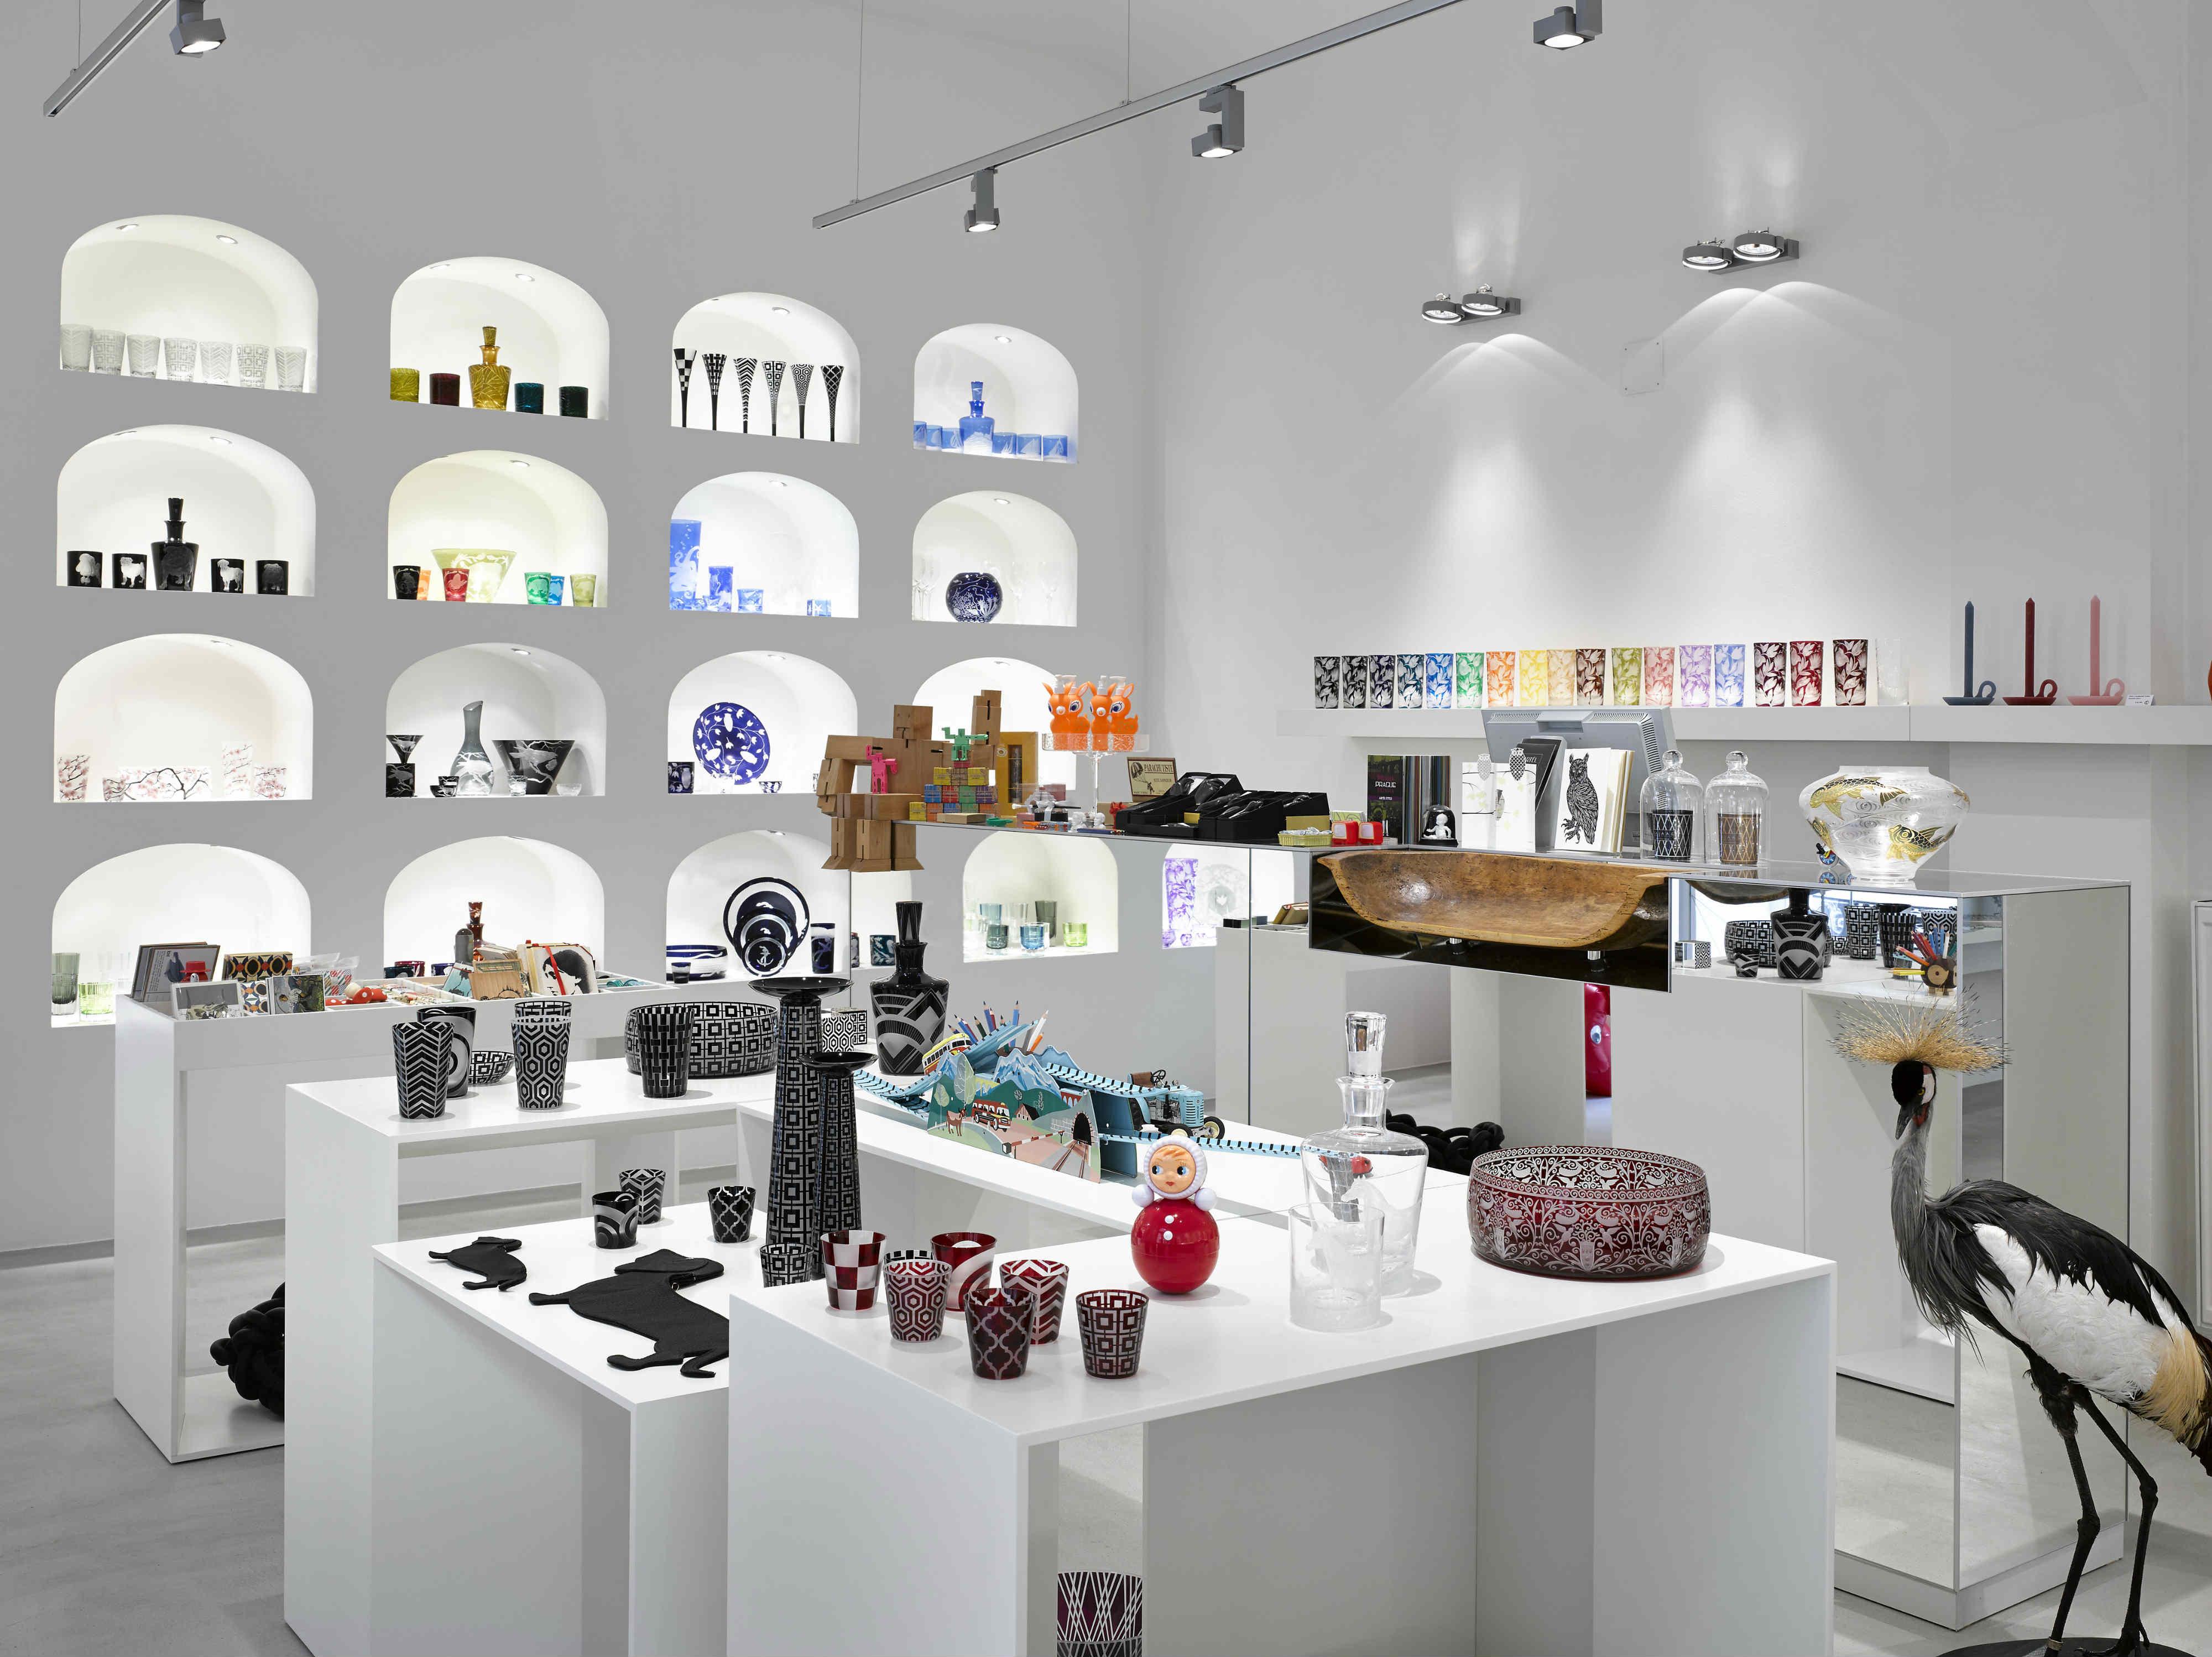 artel-concept-store-21